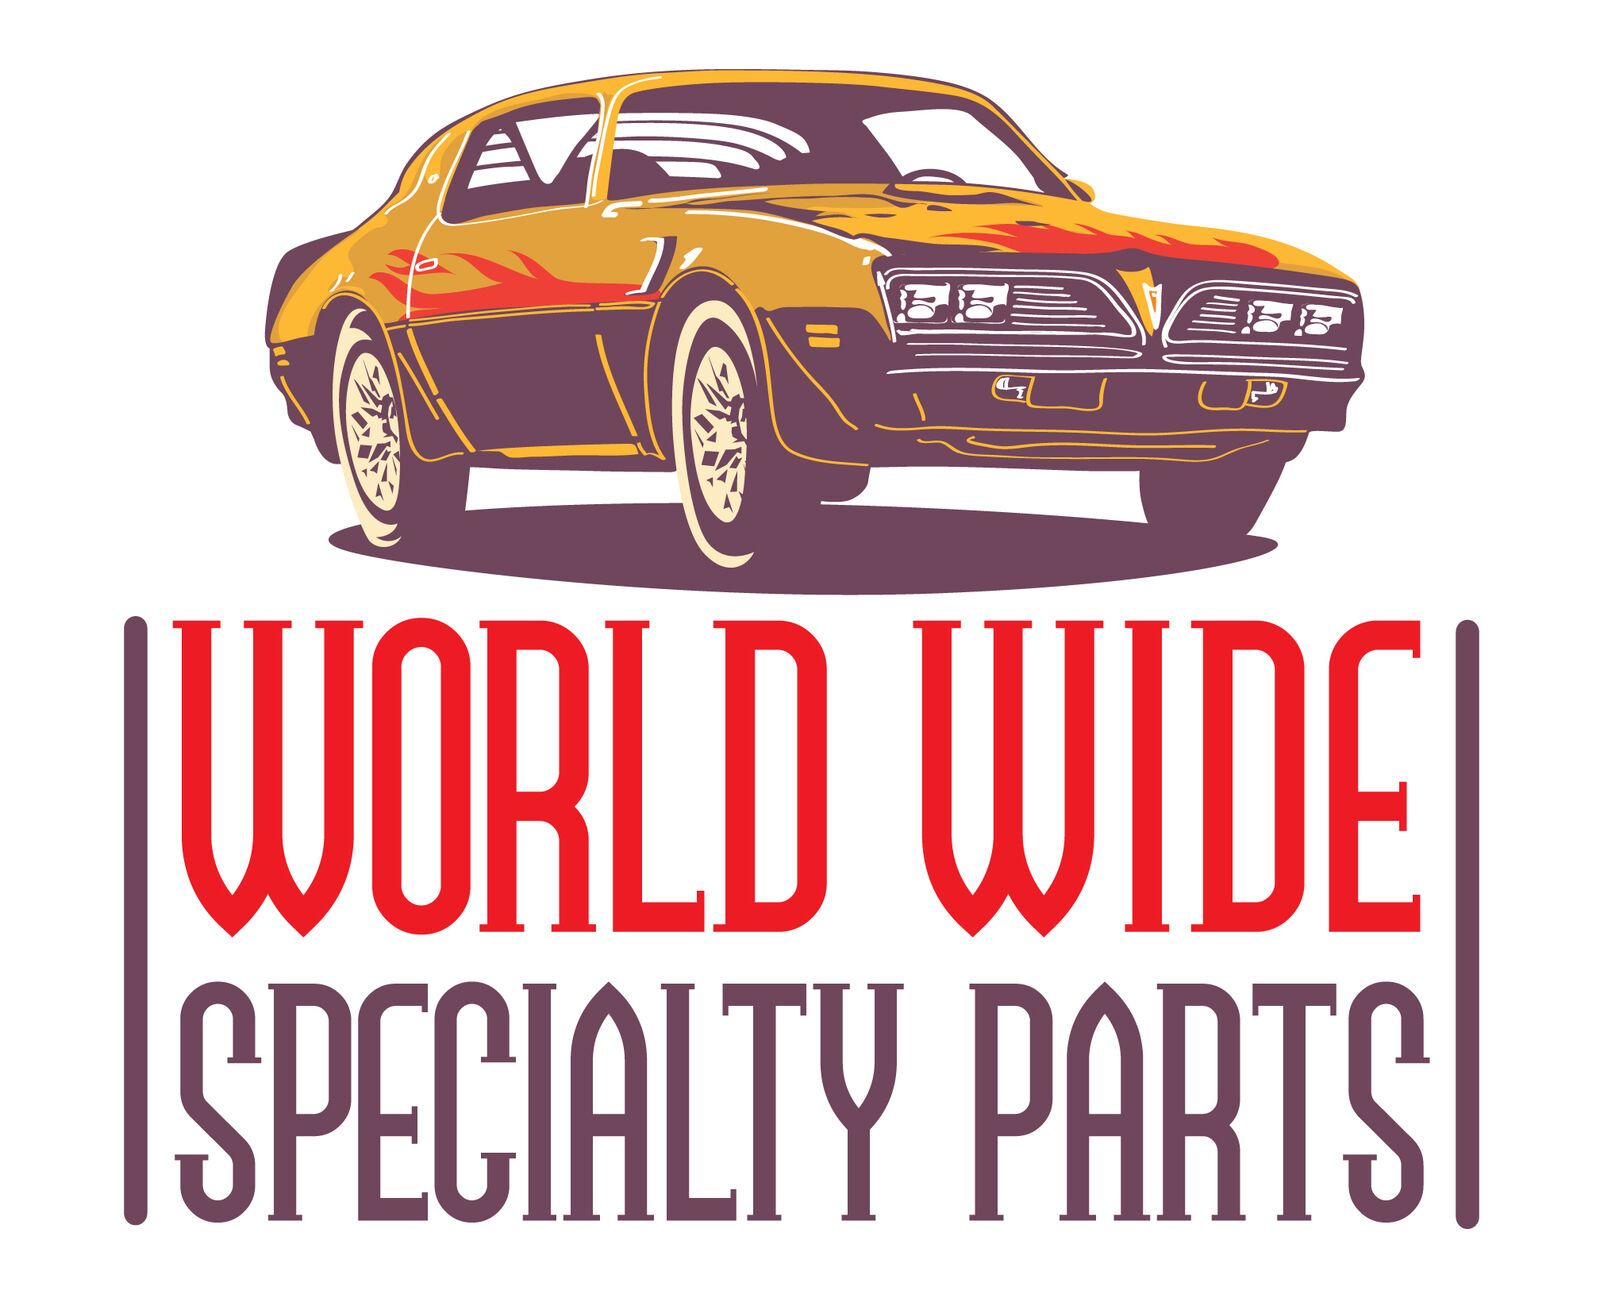 World Wide SP